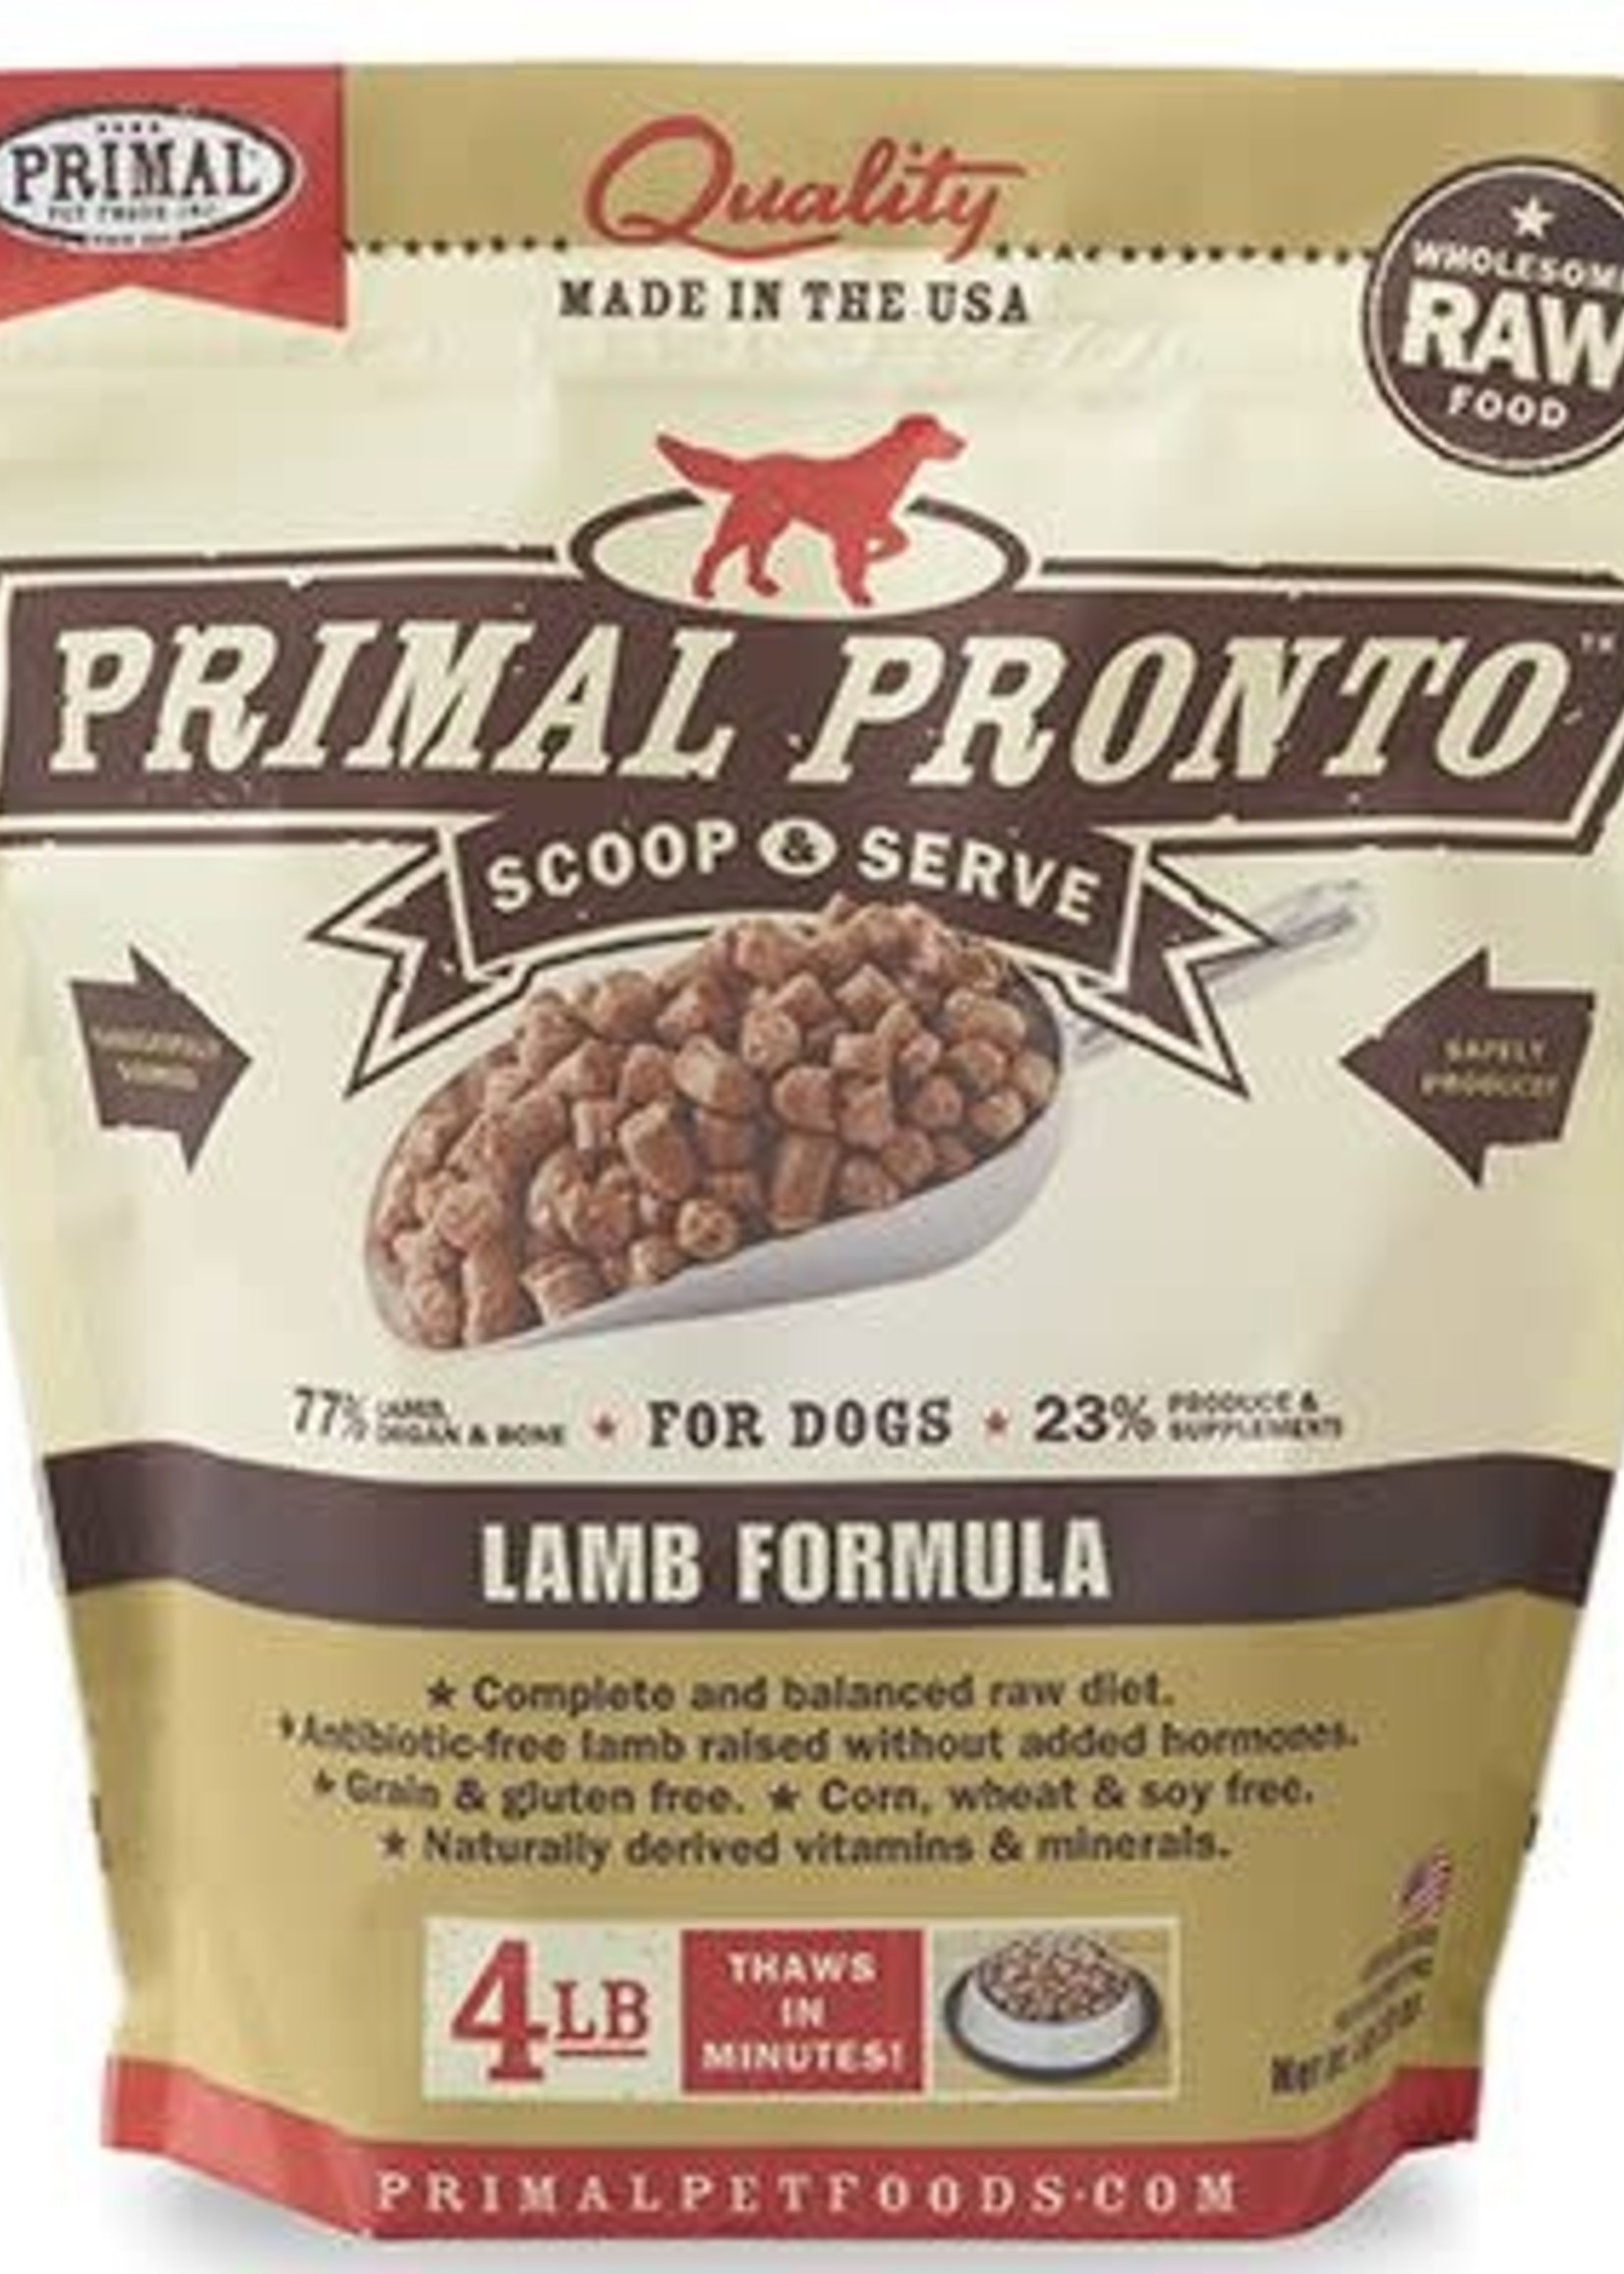 Primal Pet Foods Inc.™ Primal Pronto Scoop&Serve Raw Lamb Formula 4lbs